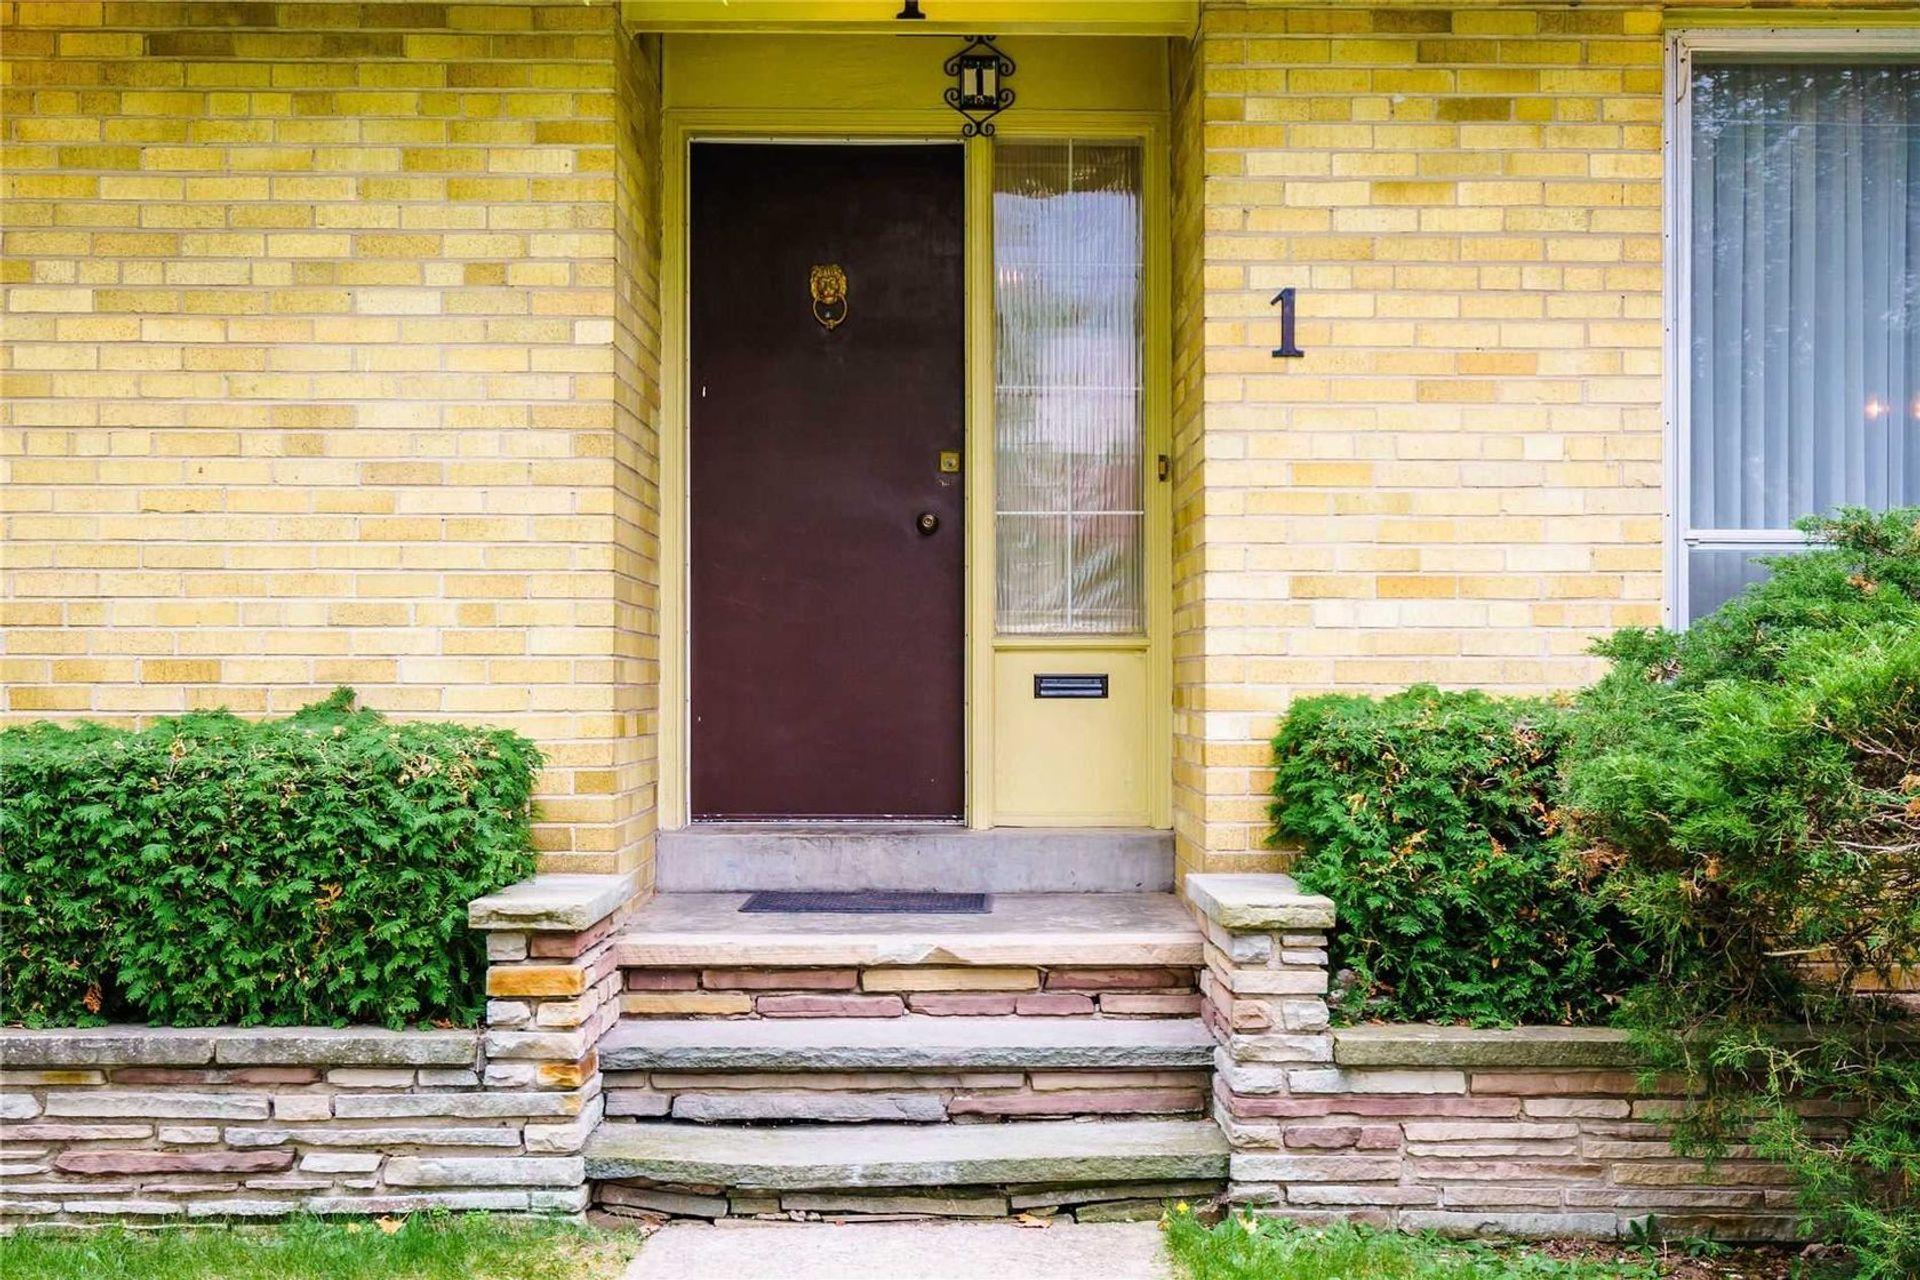 1-windham-dr-bayview-village-toronto-02 at 1 Windham Drive, Bayview Village, Toronto